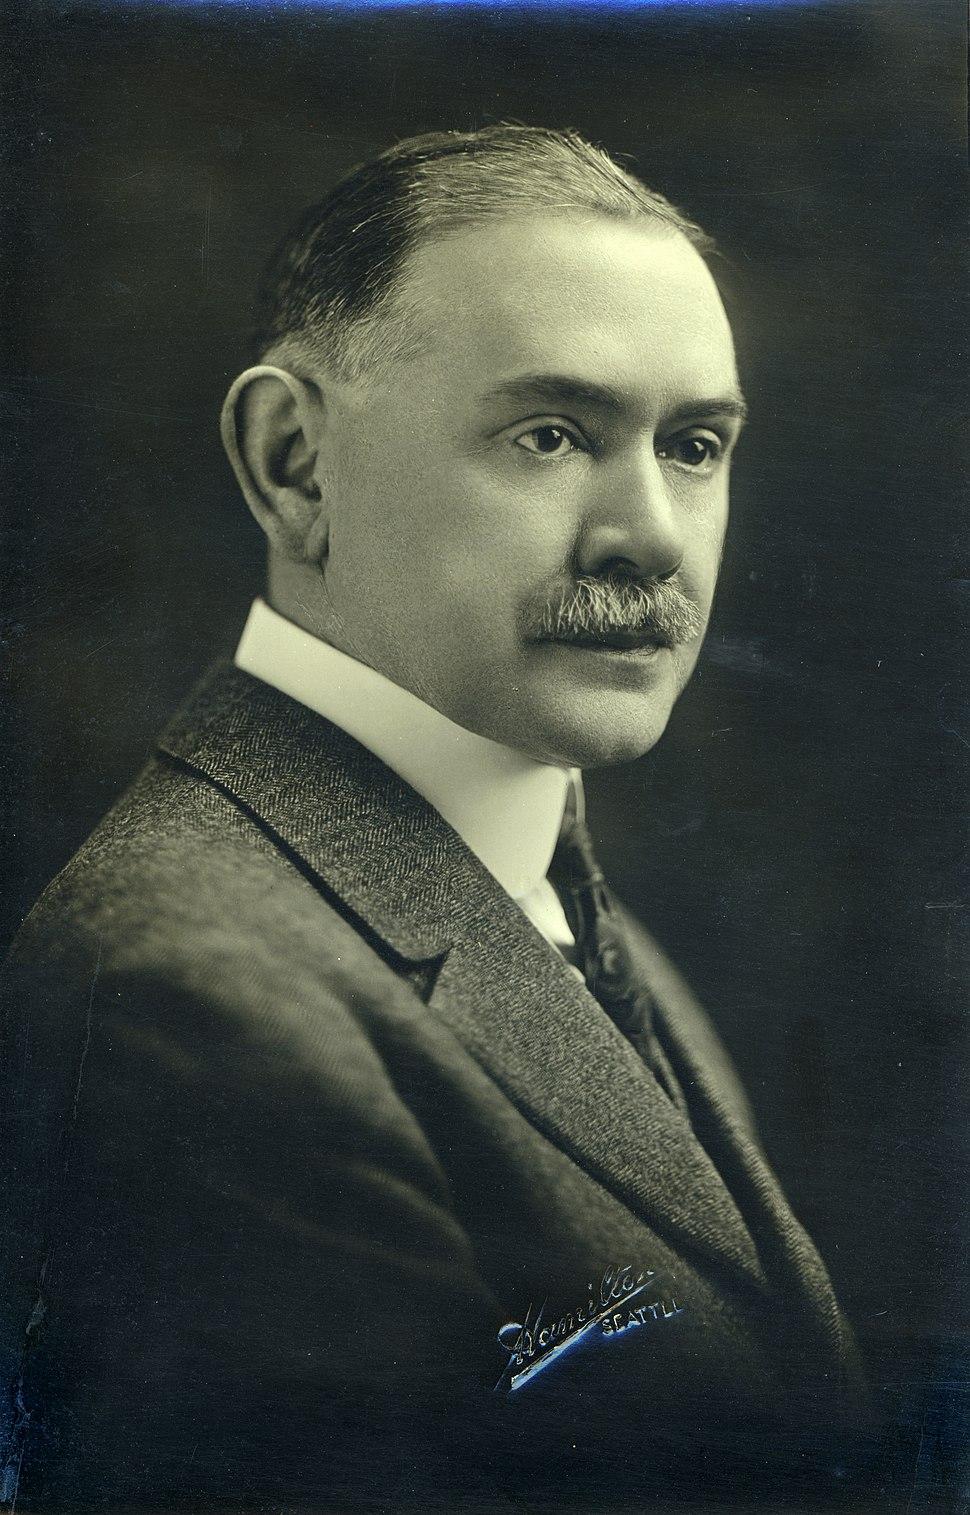 John Nathan Cobb portrait